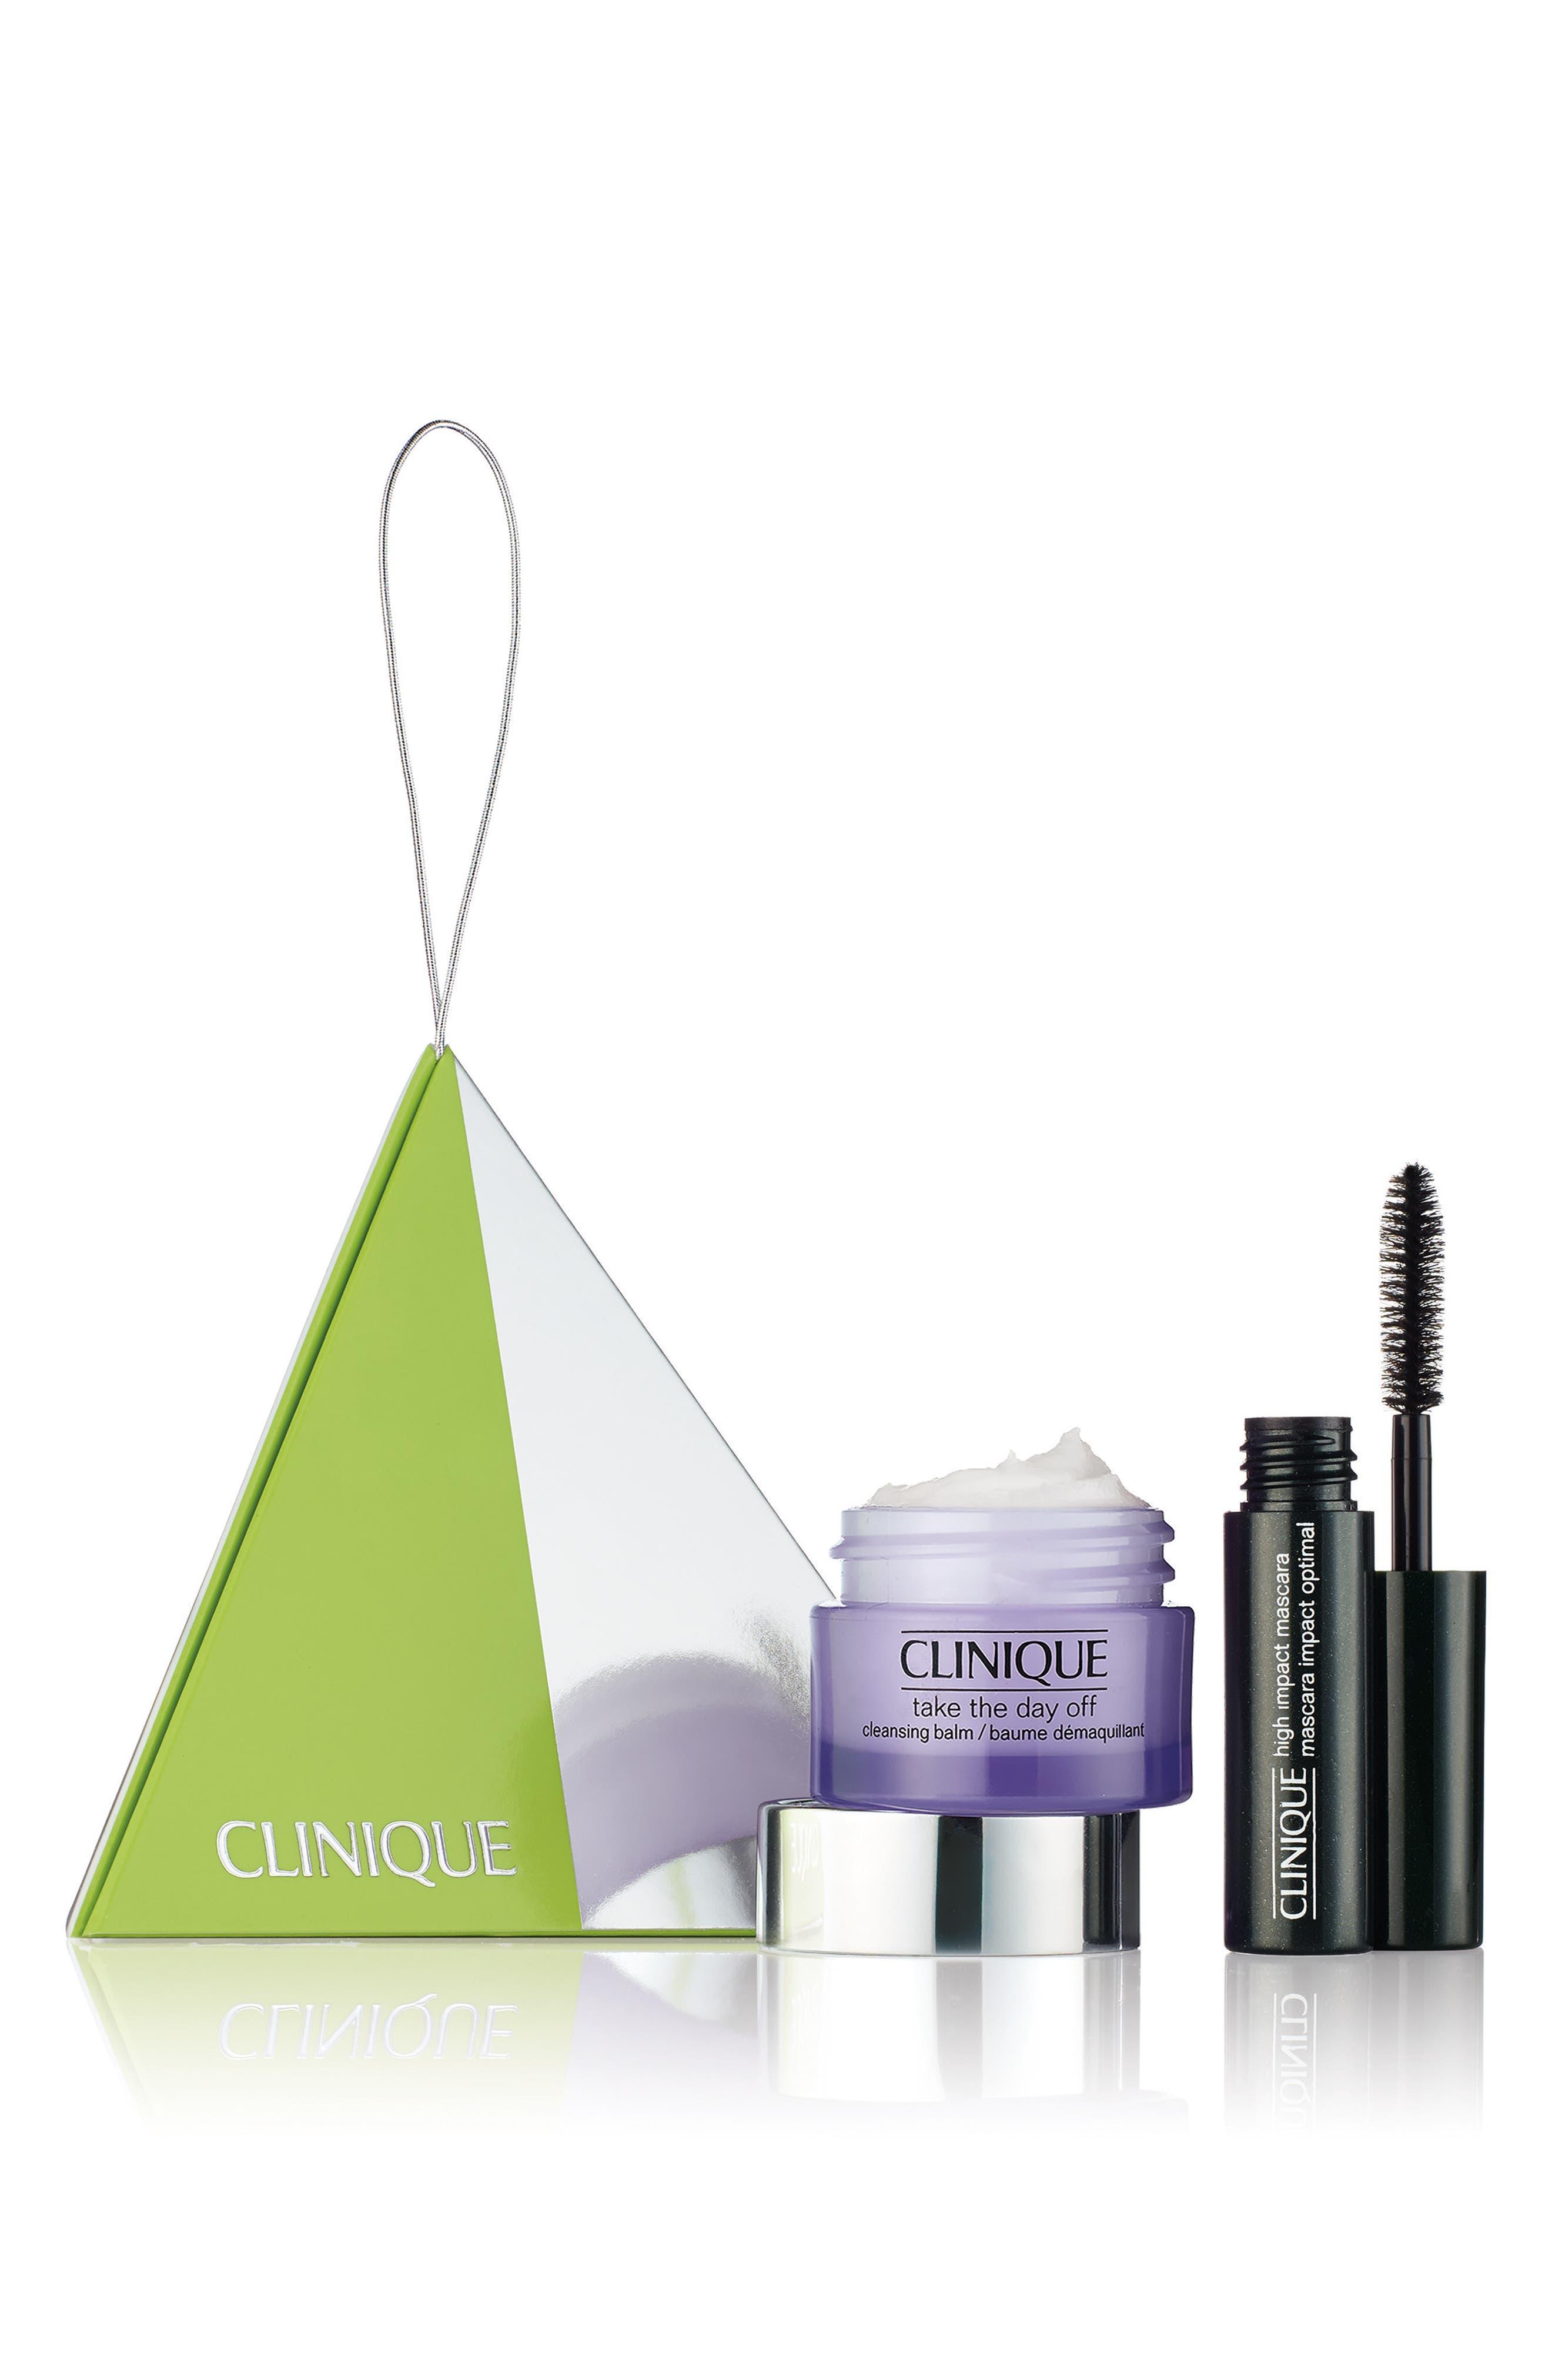 Clinique Mascara & Makeup Remover Set